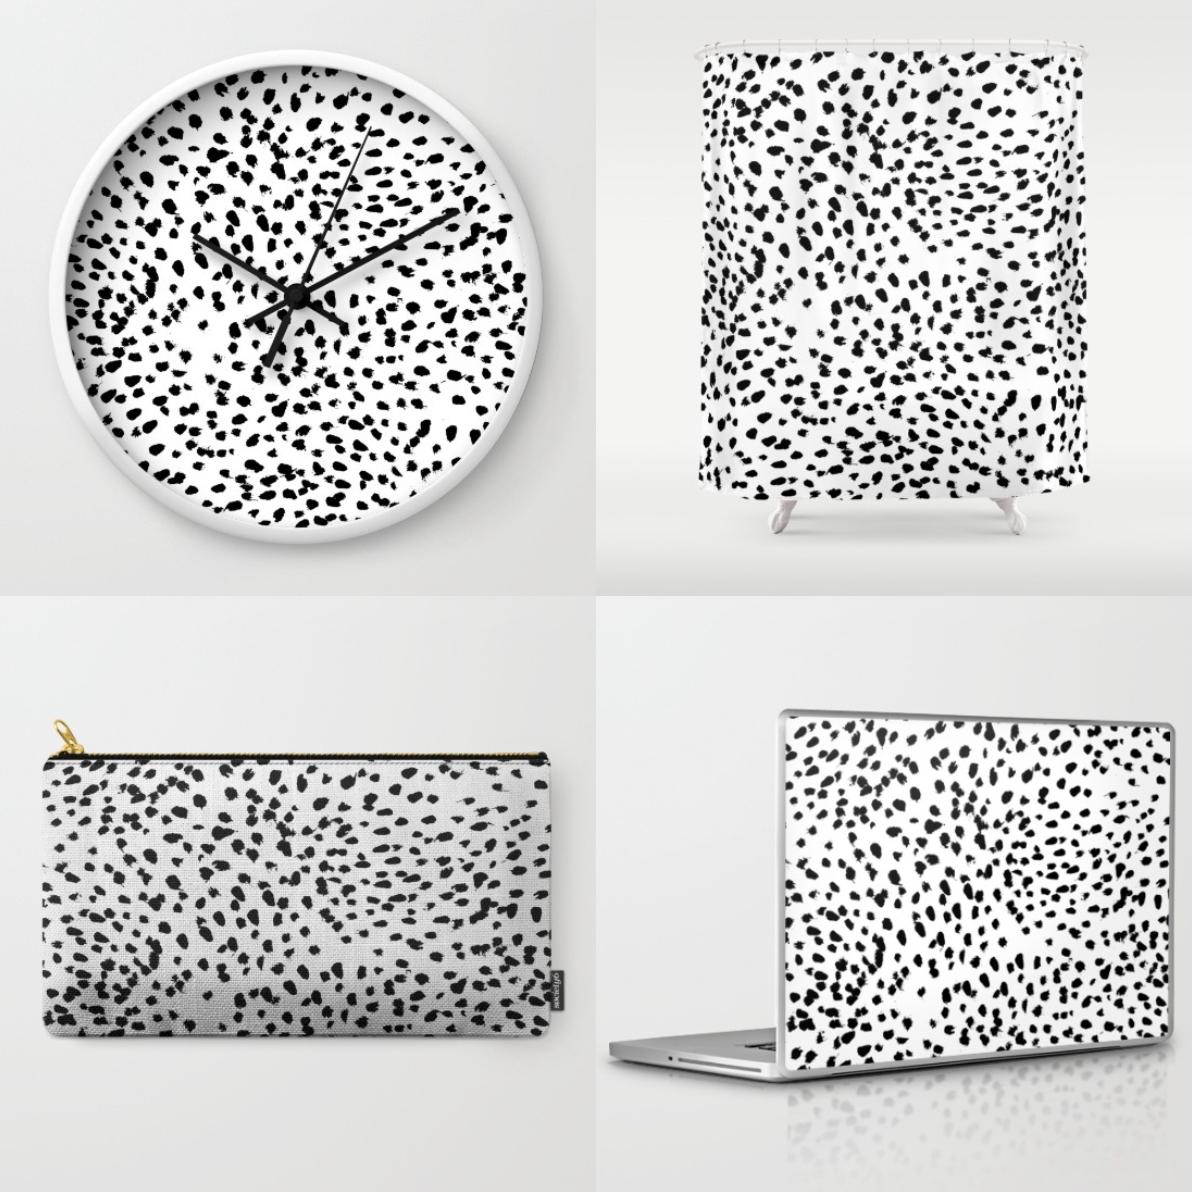 Trend Alert Dalmatian Print Home Decor: Dalmatian Spot Print Obsession + Sneak Peak At Some Of My